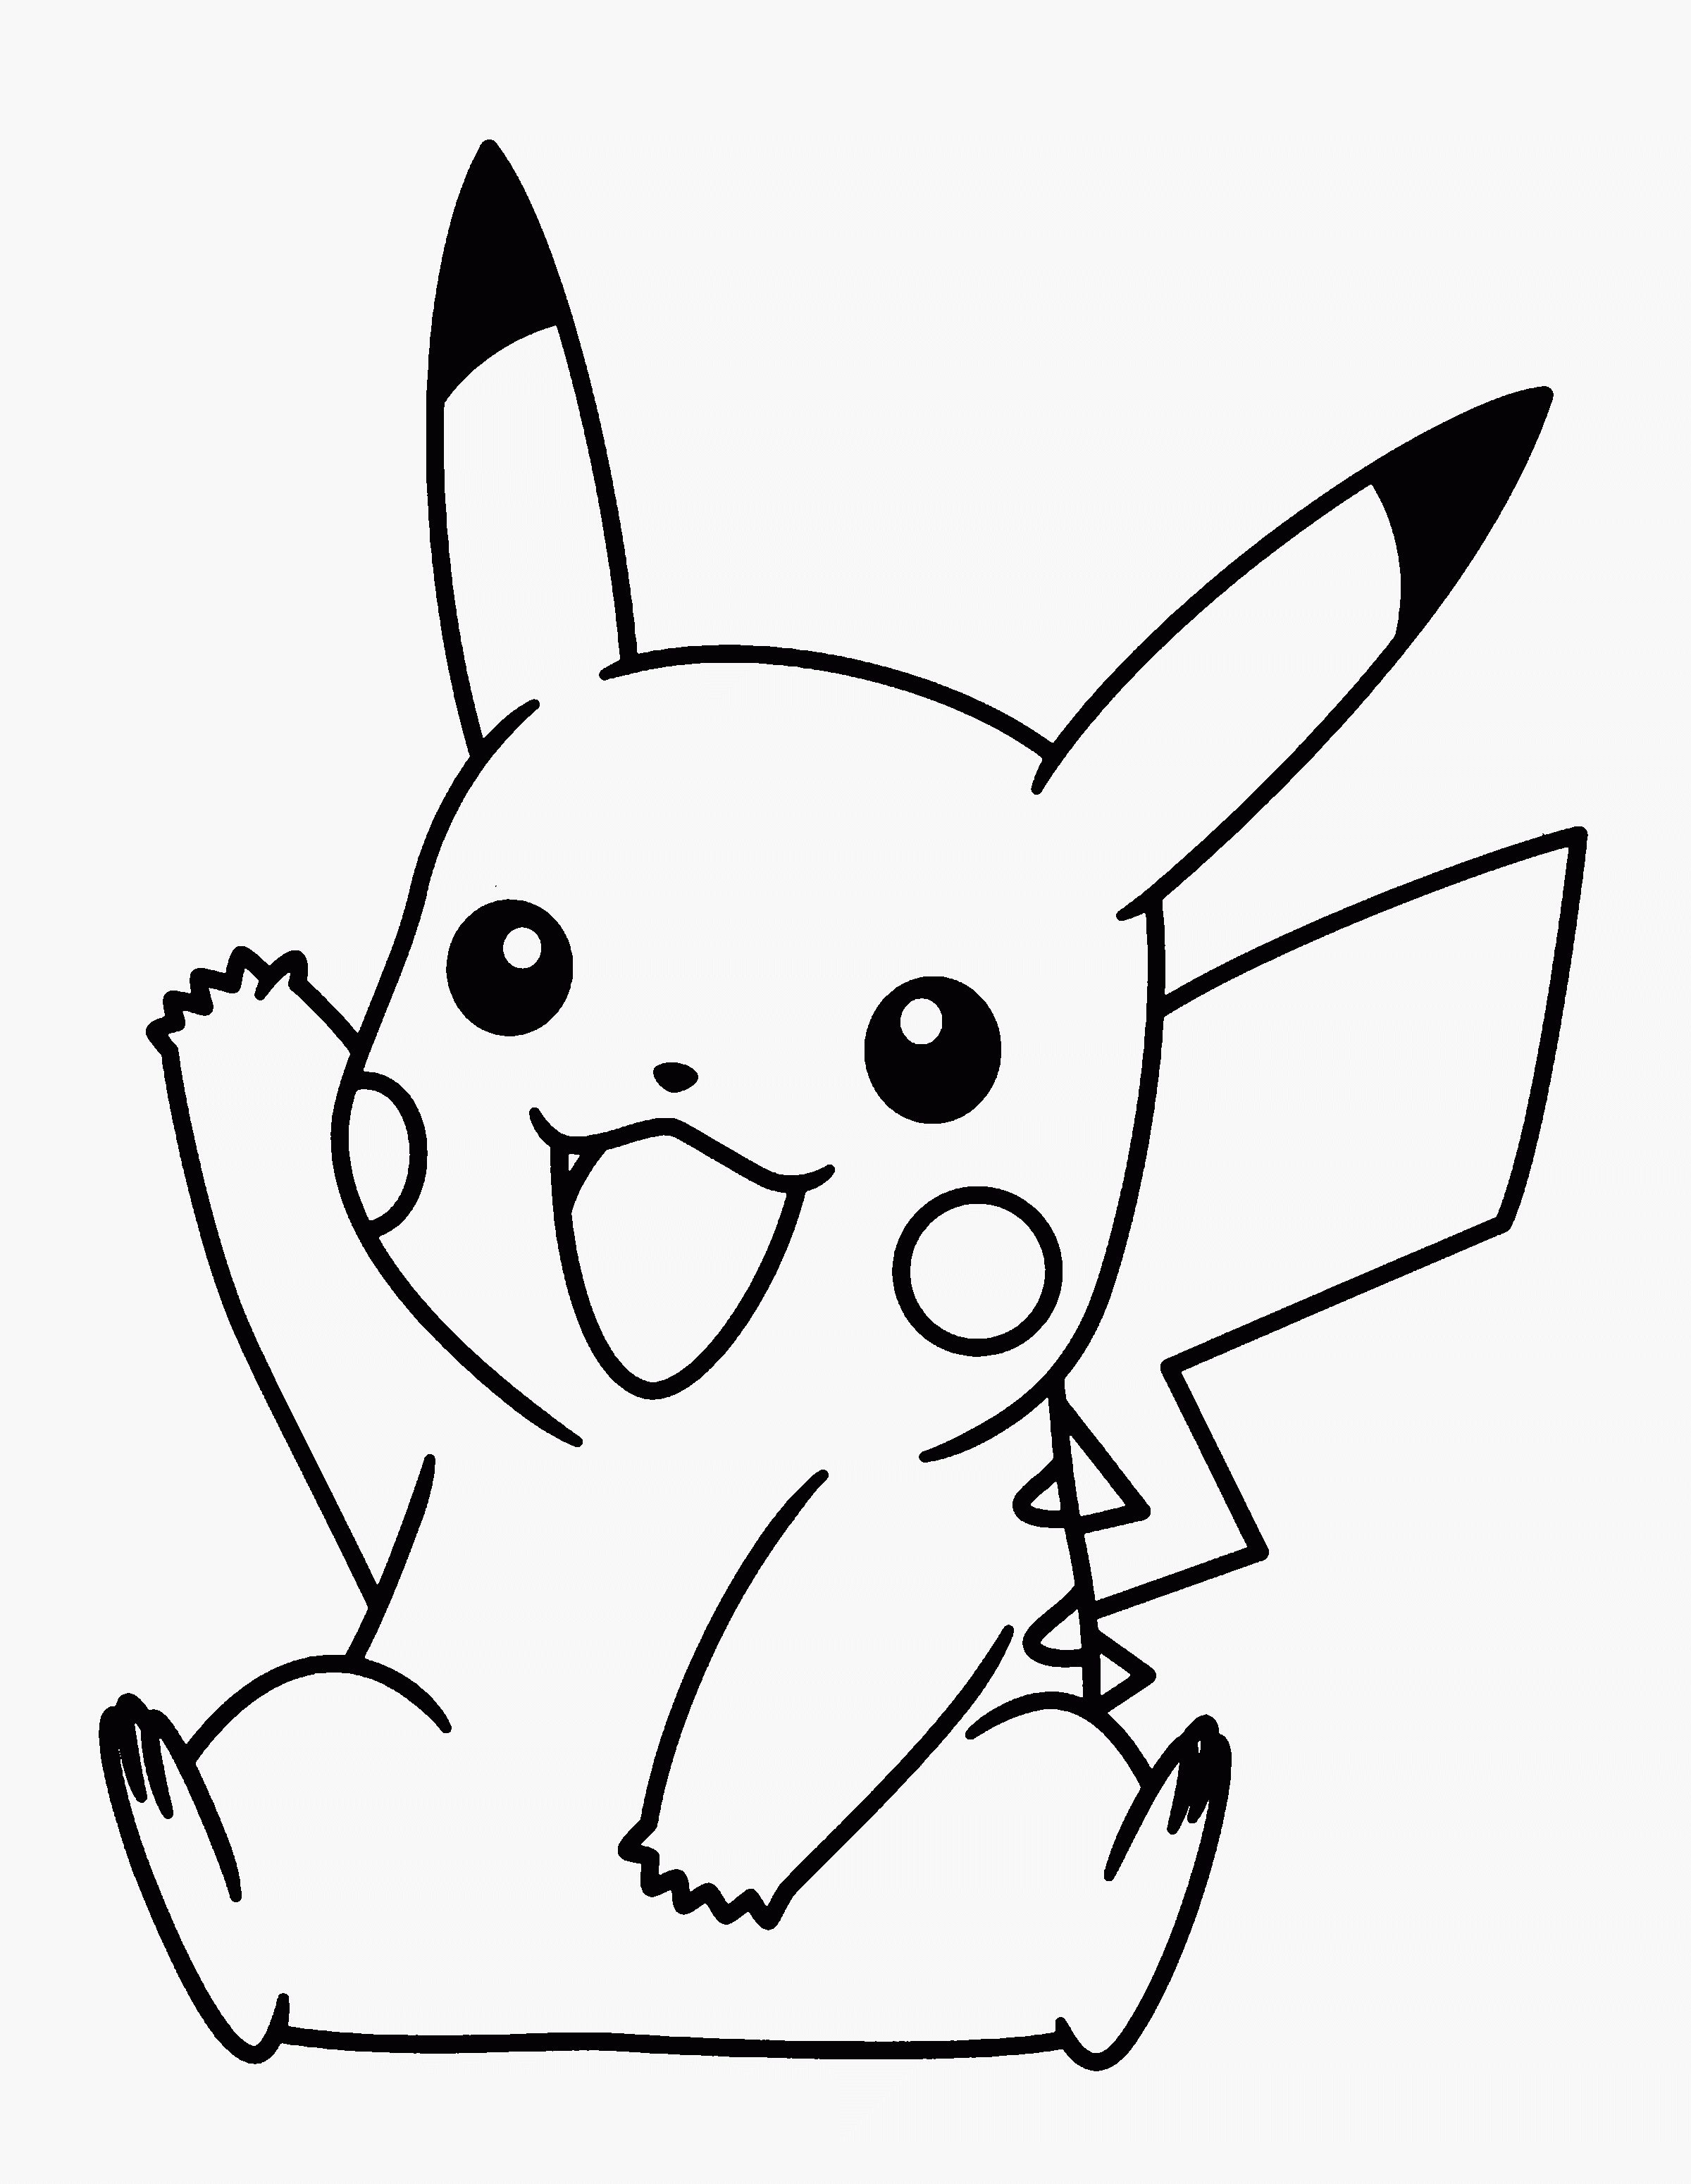 Cool Coloriage Pokemon Pikachu Coloriage Pokemon Coloriage